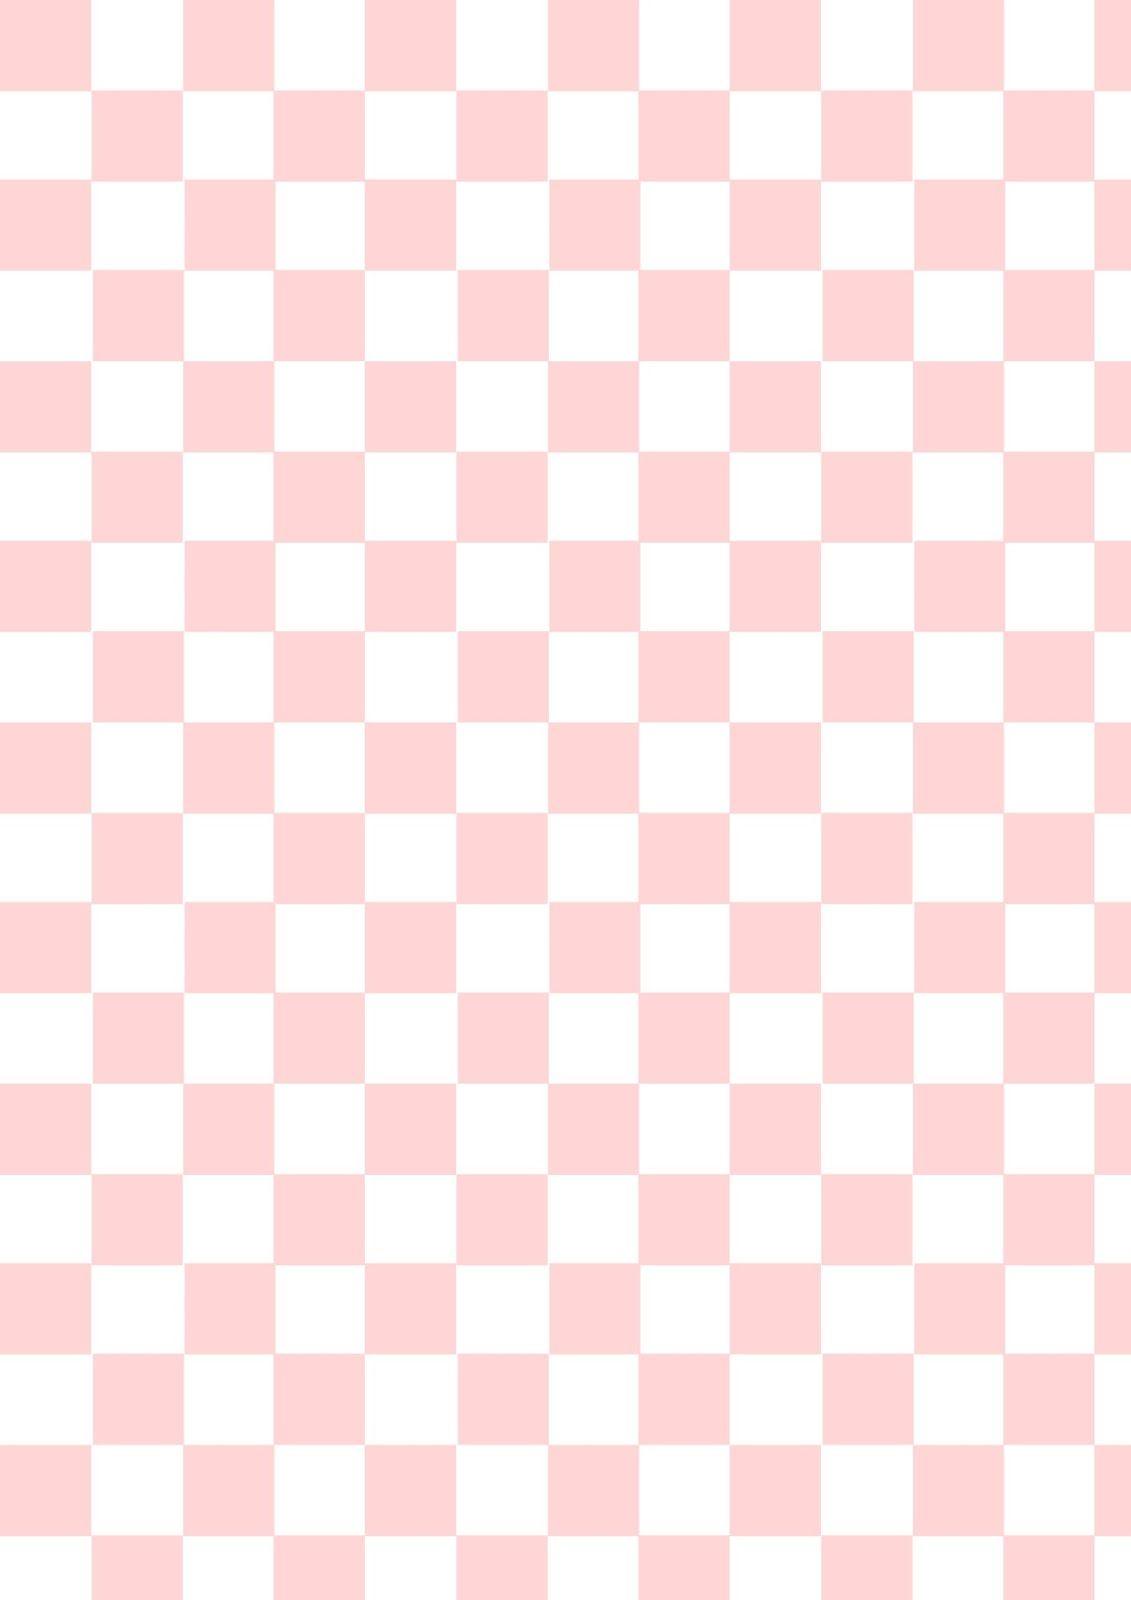 Worksheet Pattern Printable free printable checkerboard pattern paper pinkwhite diary note pinkwhite